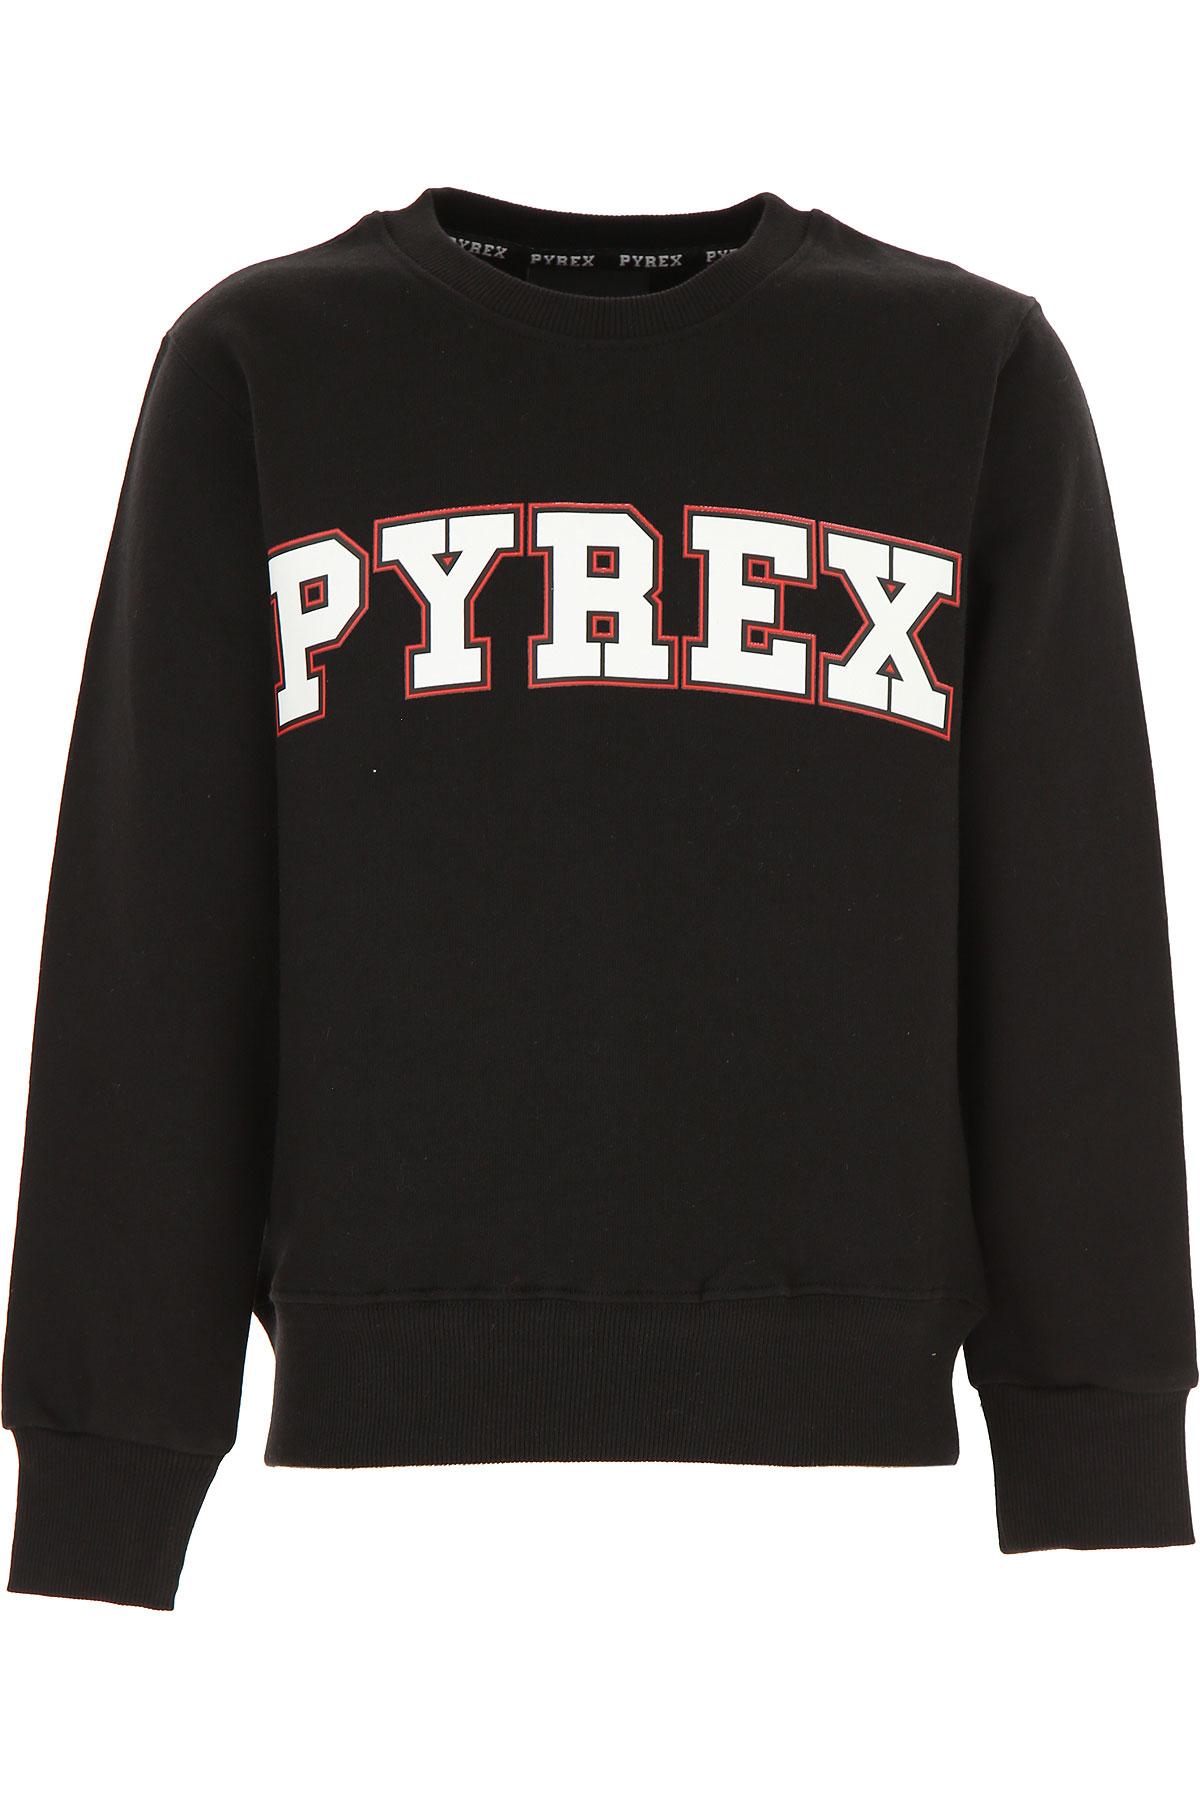 Pyrex Kids Sweatshirts & Hoodies for Boys On Sale, Black, Cotton, 2019, M XL XS XXL (16 Y)